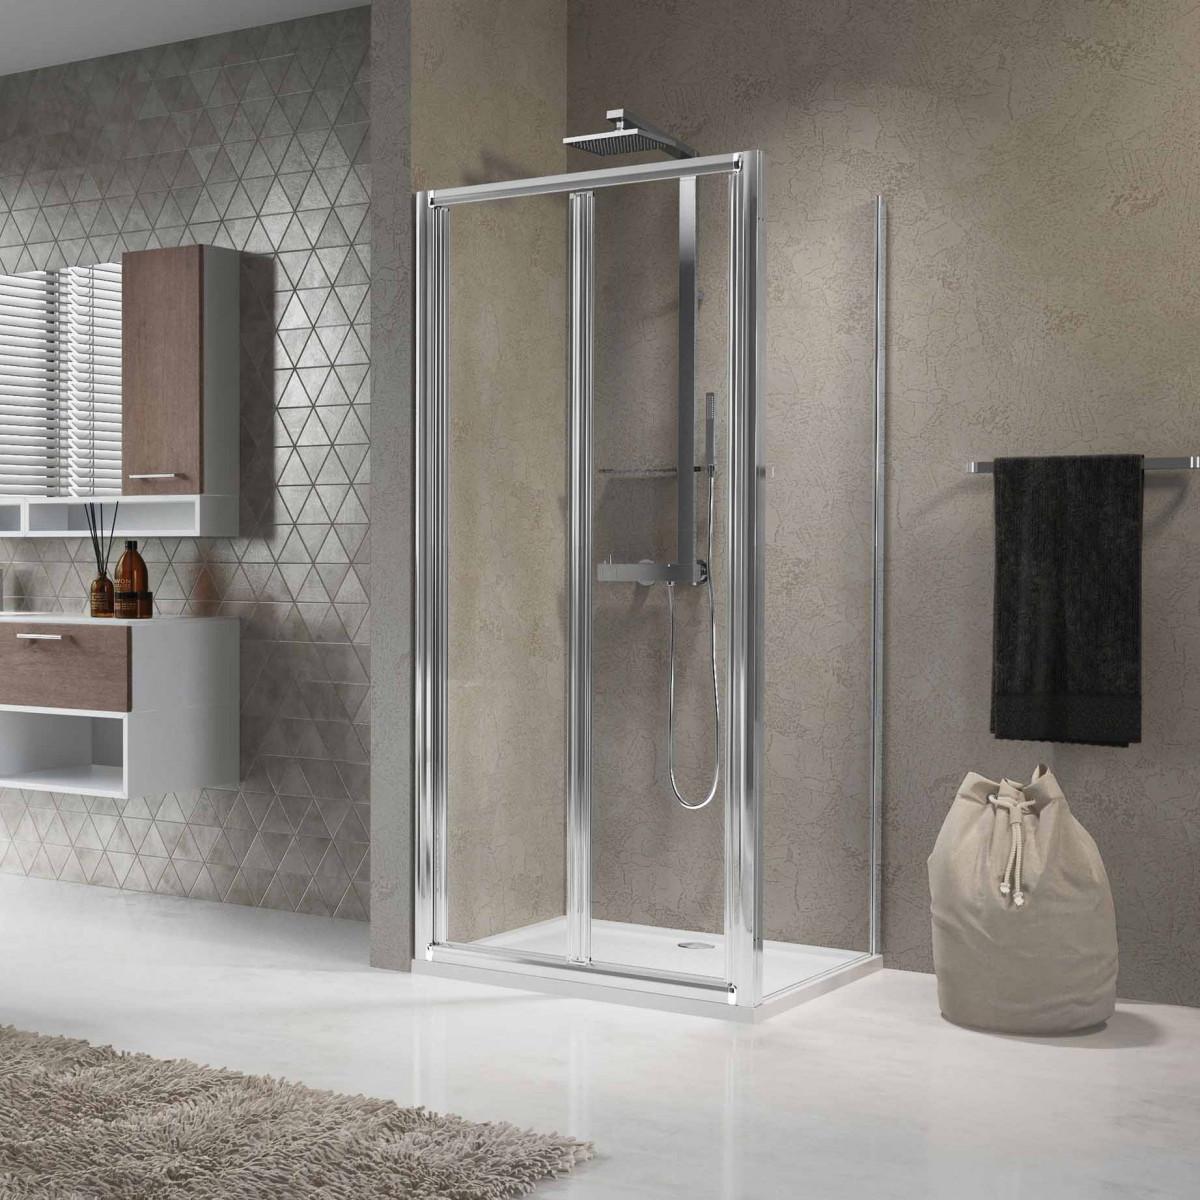 Novellini lunes 960mm bifold shower door luness90 for Novellini shower doors